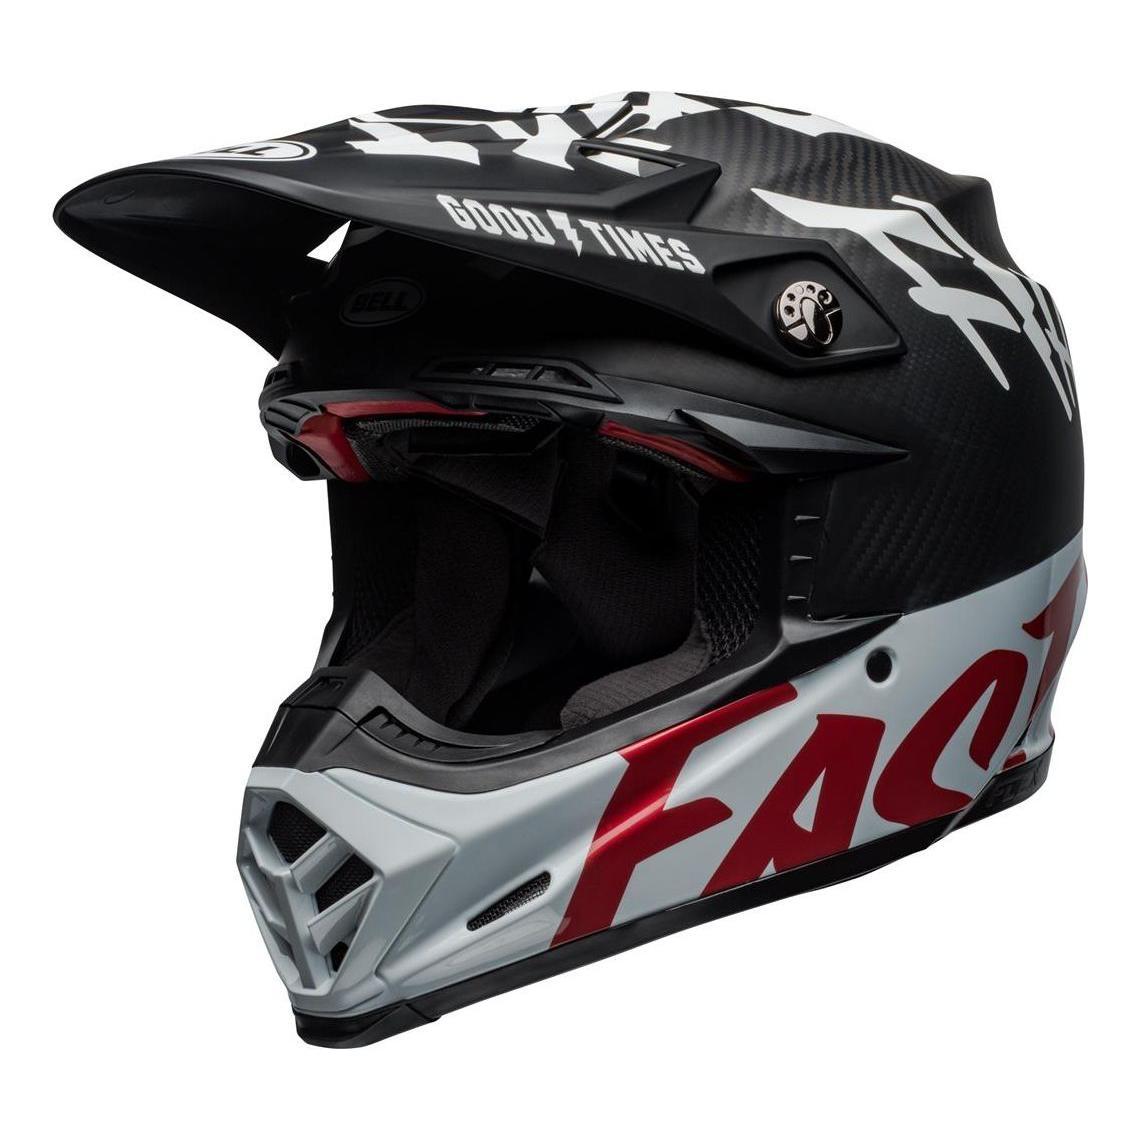 Casque cross Bell Moto-9 Flex Fasthouse WRWF noir/blanc/rouge - XS